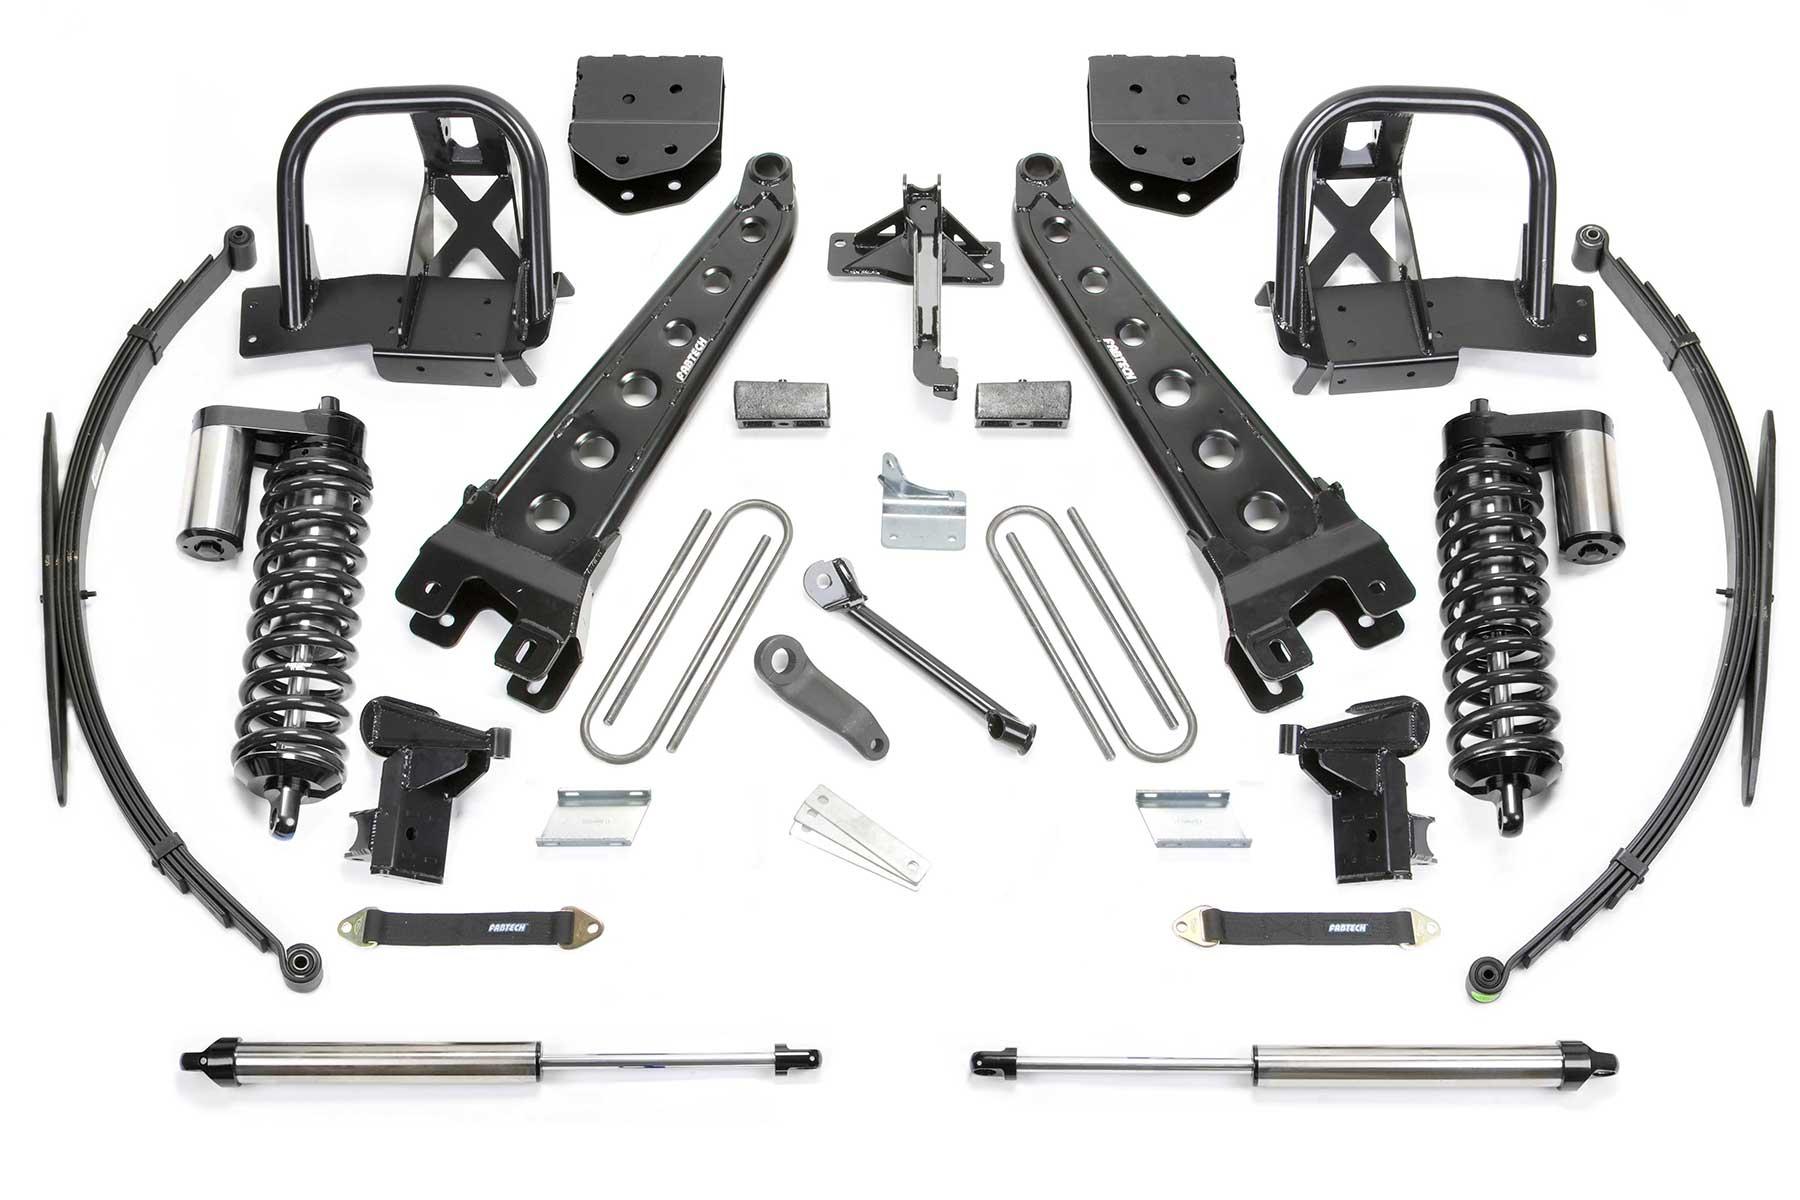 10 Radius Arm System W Dirt Logic 4 0 Coilovers Amp Rear Dirt Logic Shocks